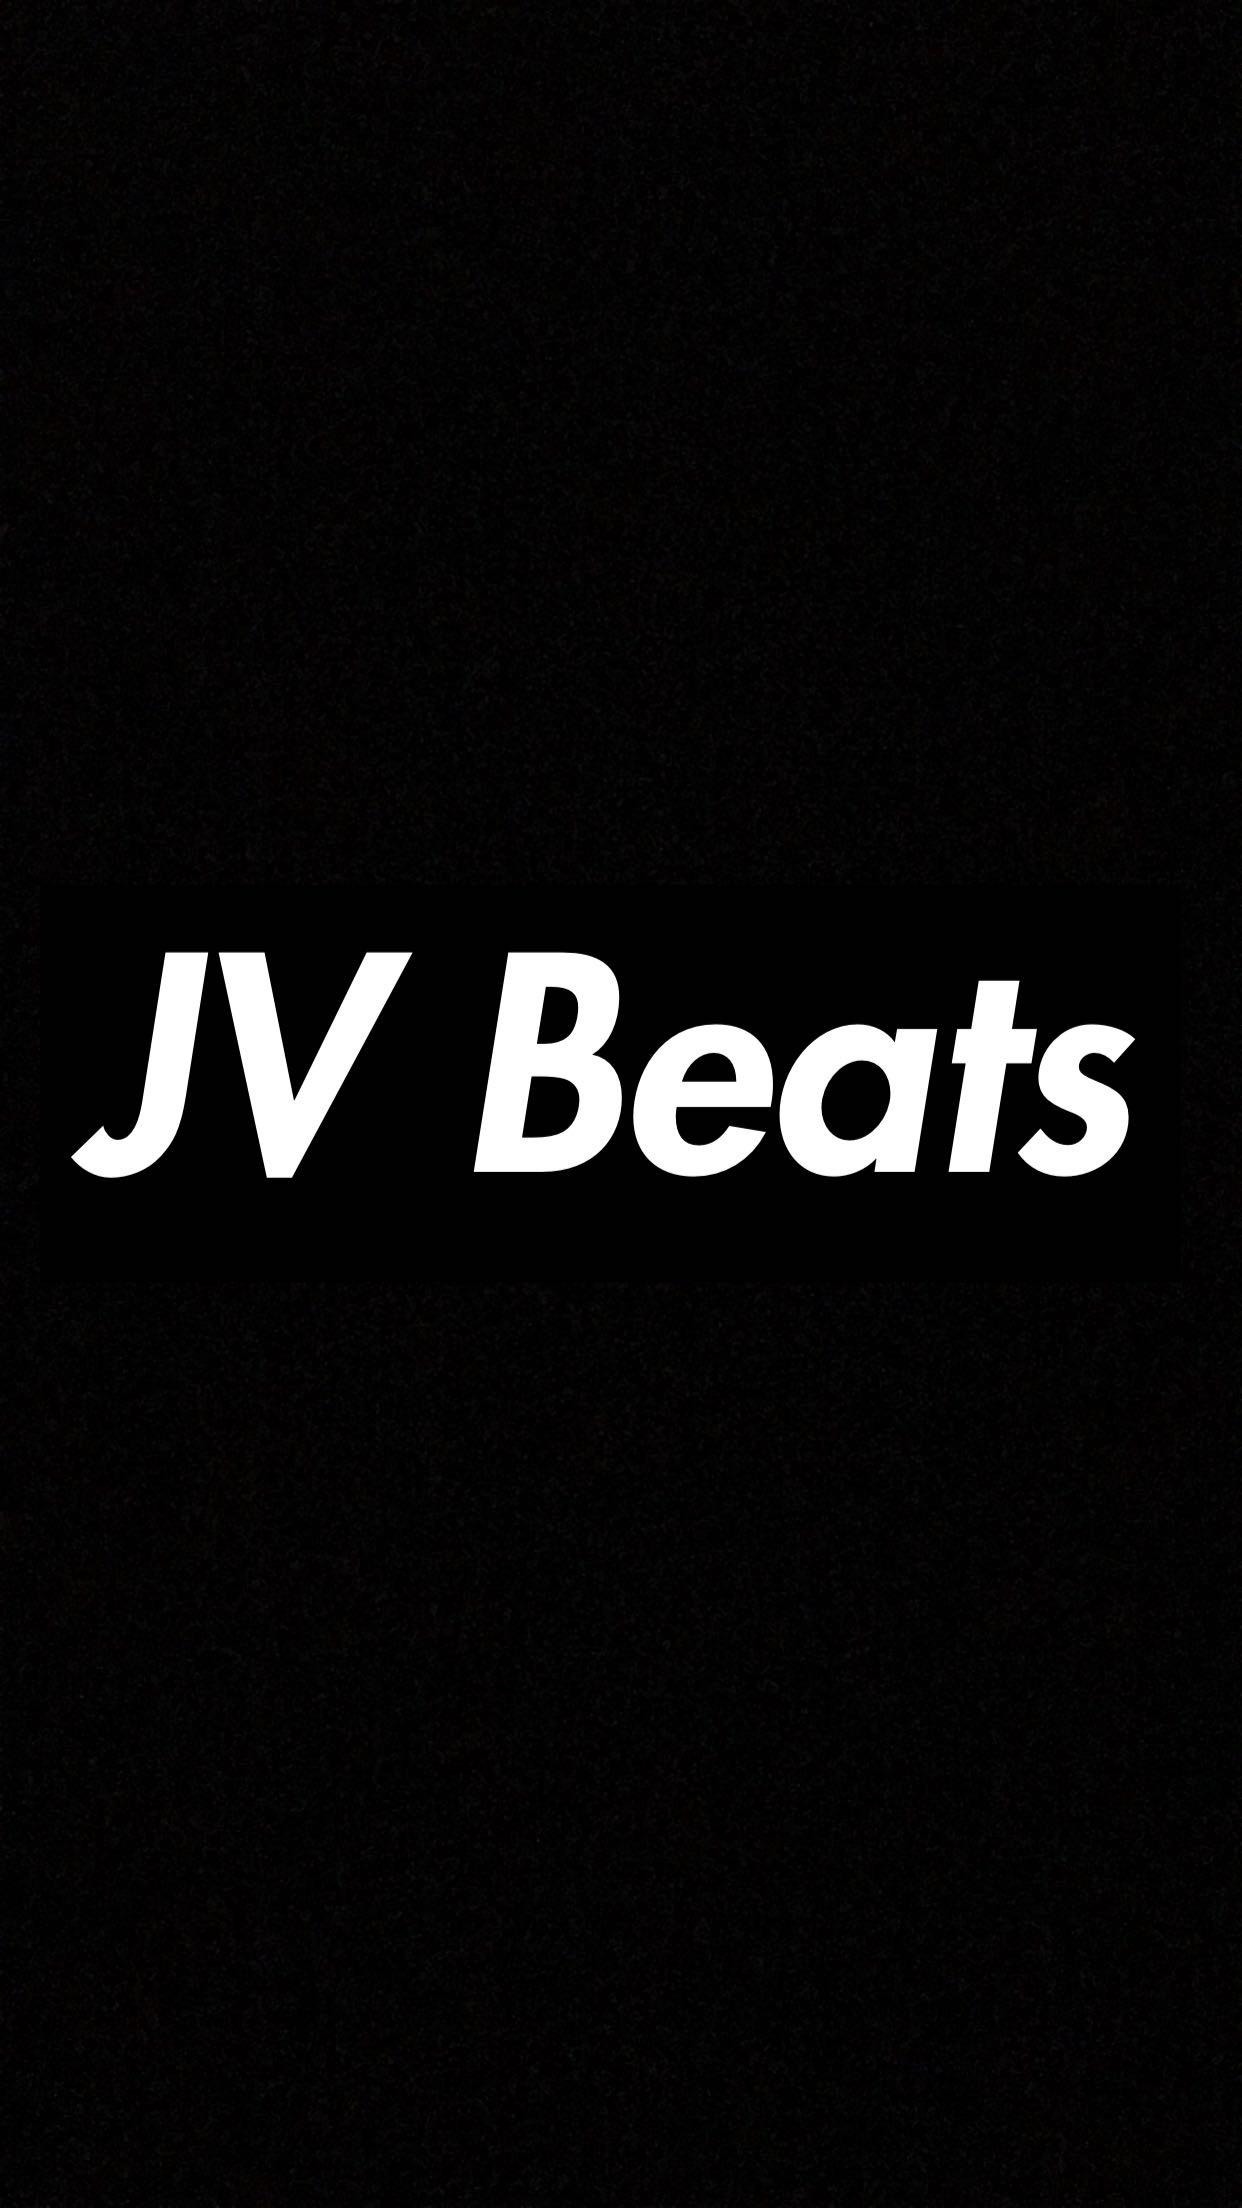 JV Beats